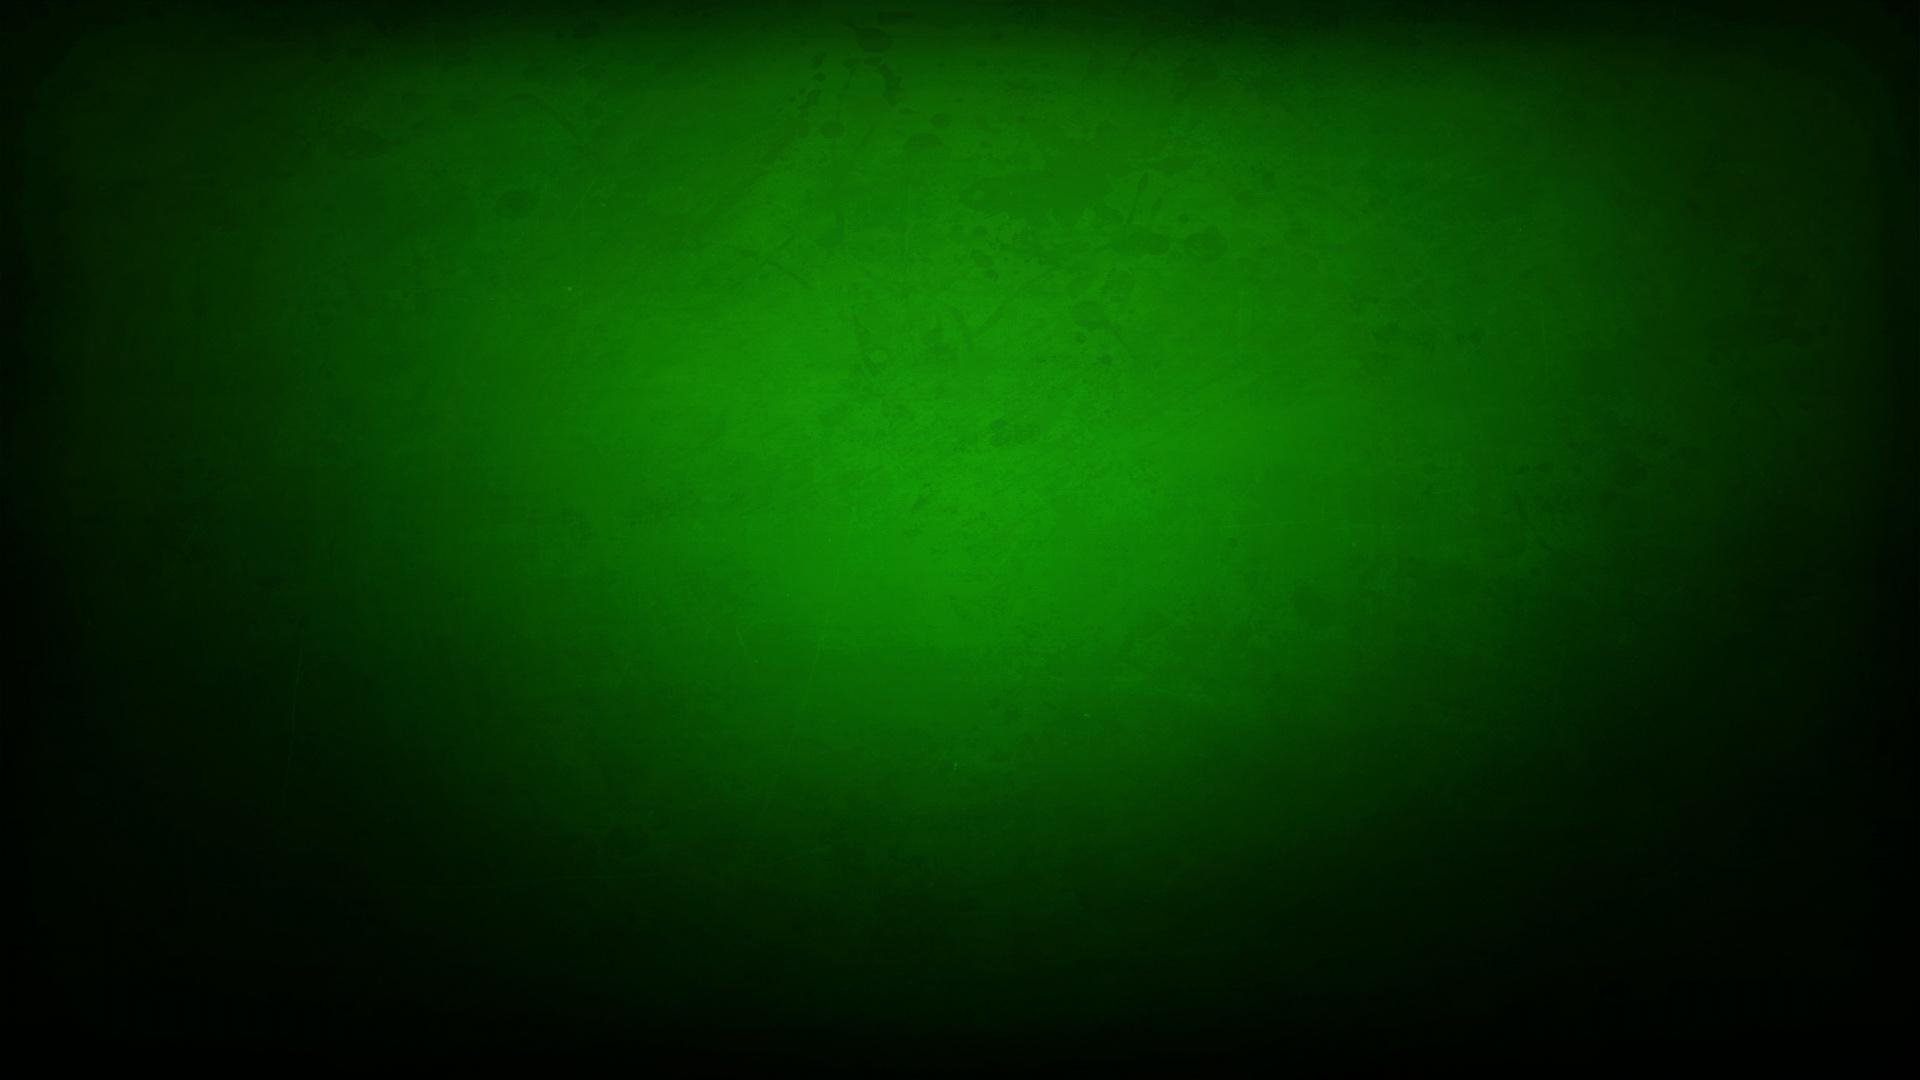 1920x1080 Grunge Green desktop PC and Mac wallpaper 1920x1080